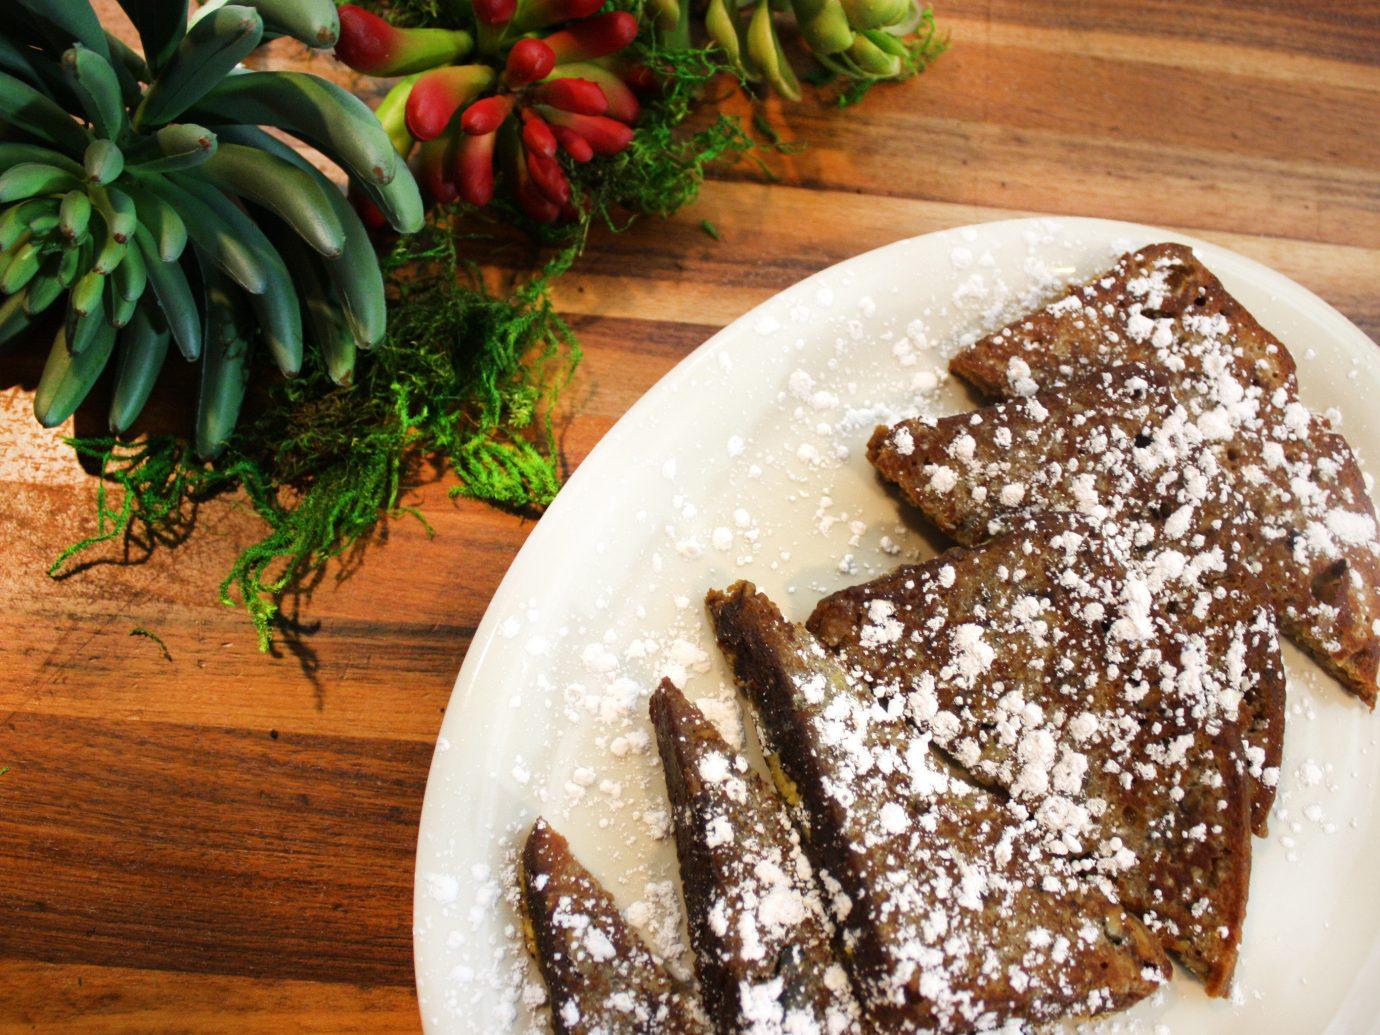 Food + Drink plate food table plant dish meal piece produce land plant breakfast dessert coconut flavor slice baking fresh